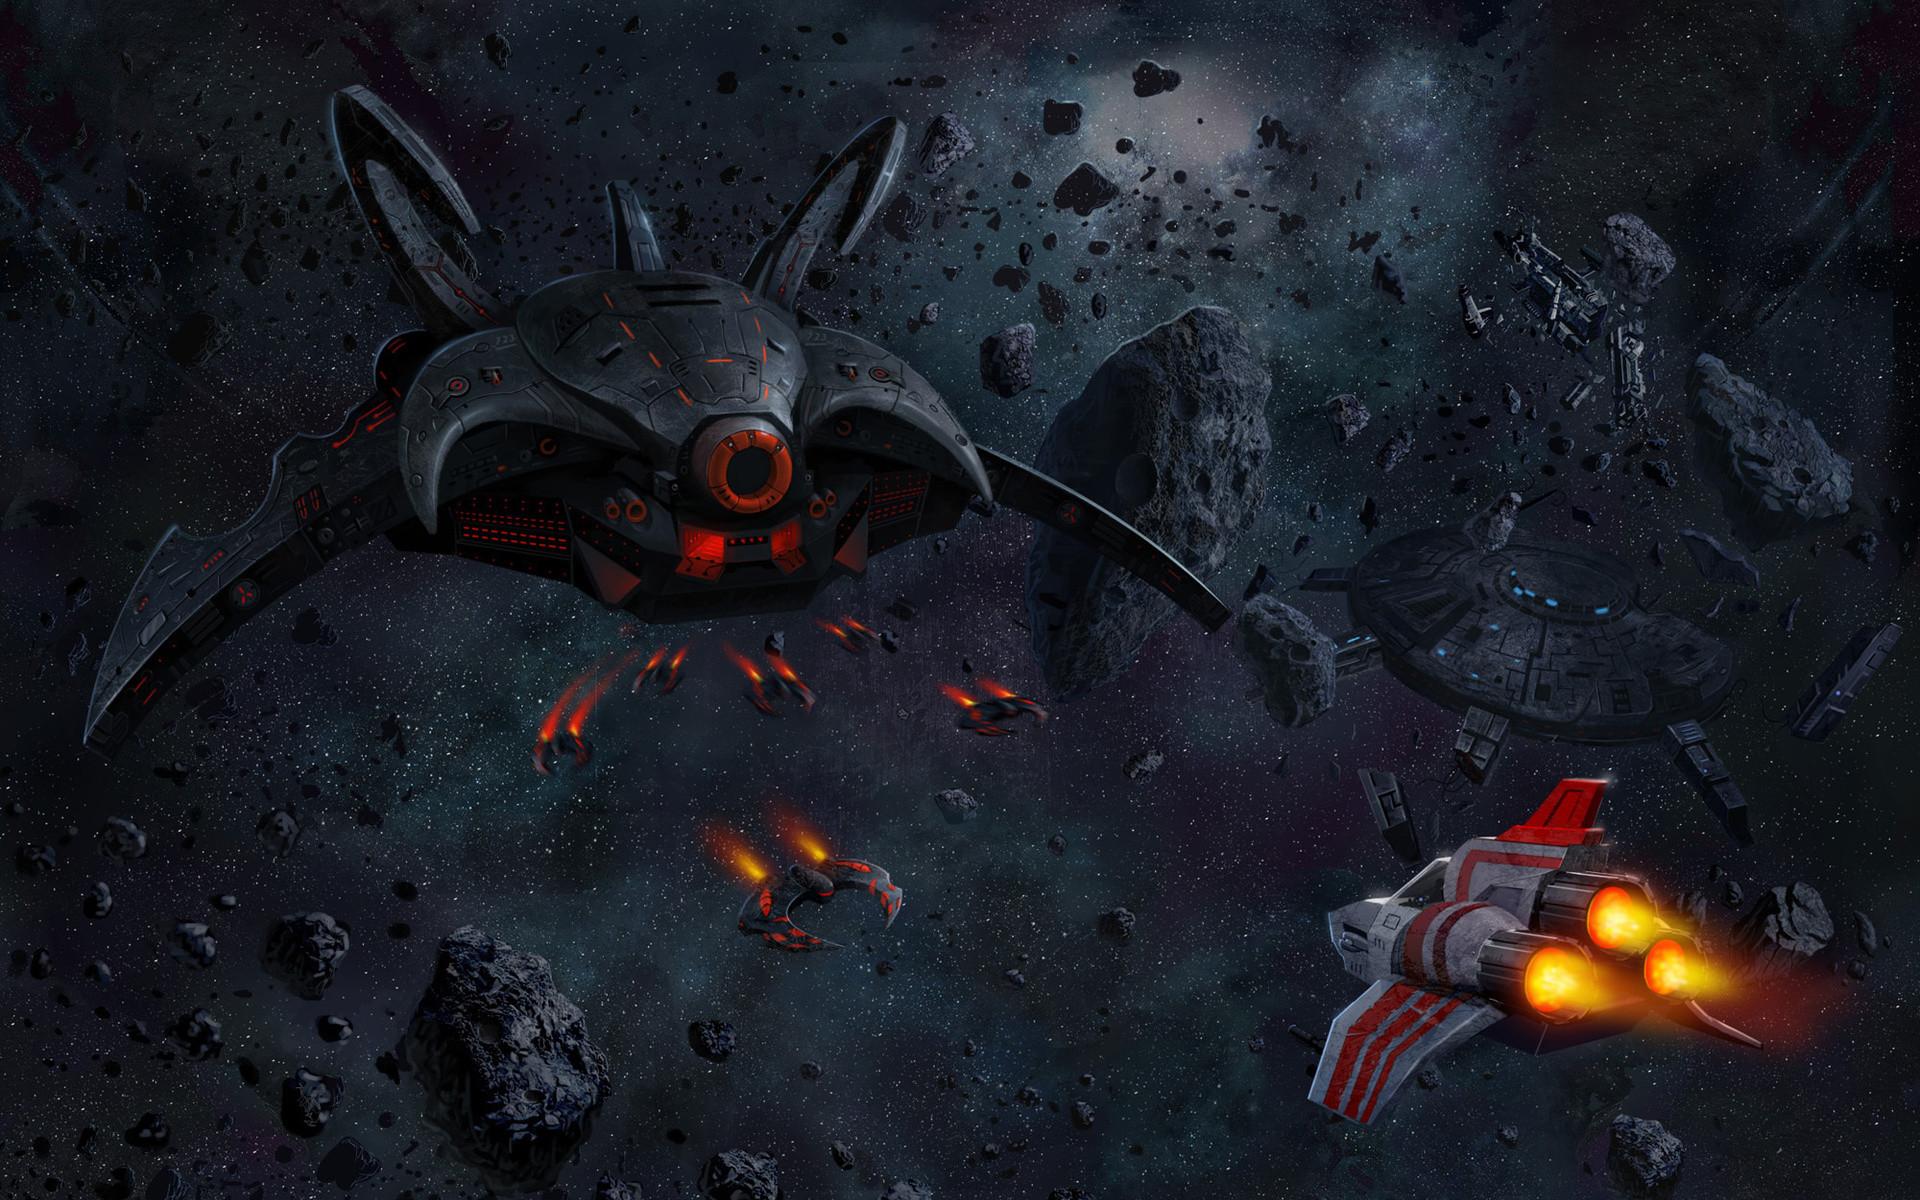 TV Show – Battlestar Galactica (2003) Battlestar Galactica Spaceship Dark  Adventure Battle Sci Fi